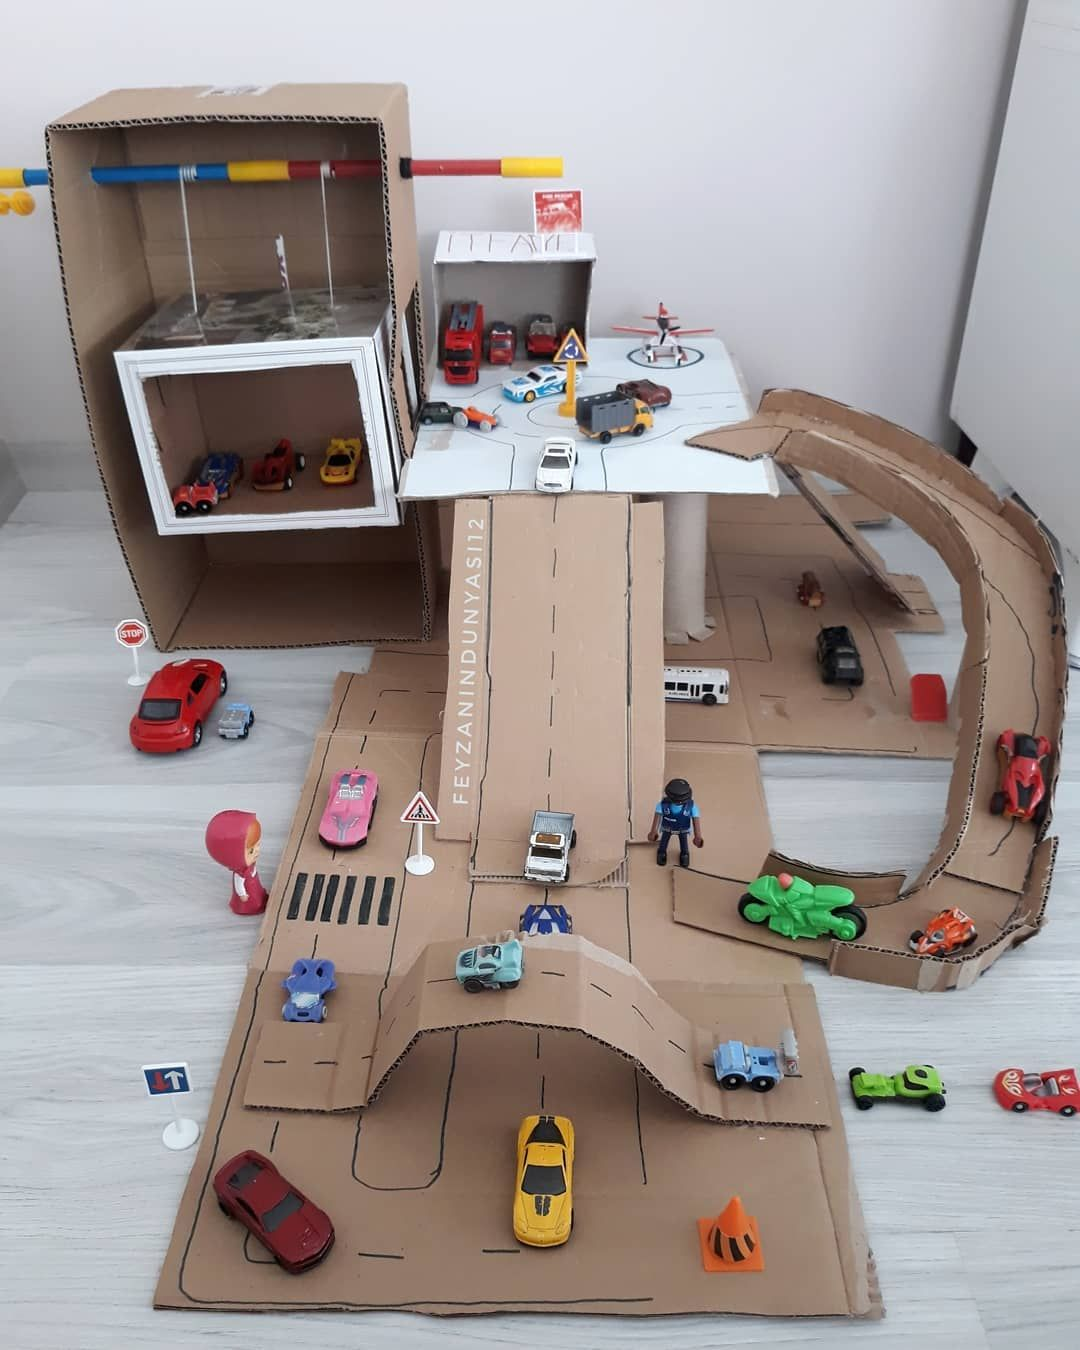 97 Cardboard Box Activities & Crafts for Kids - HA